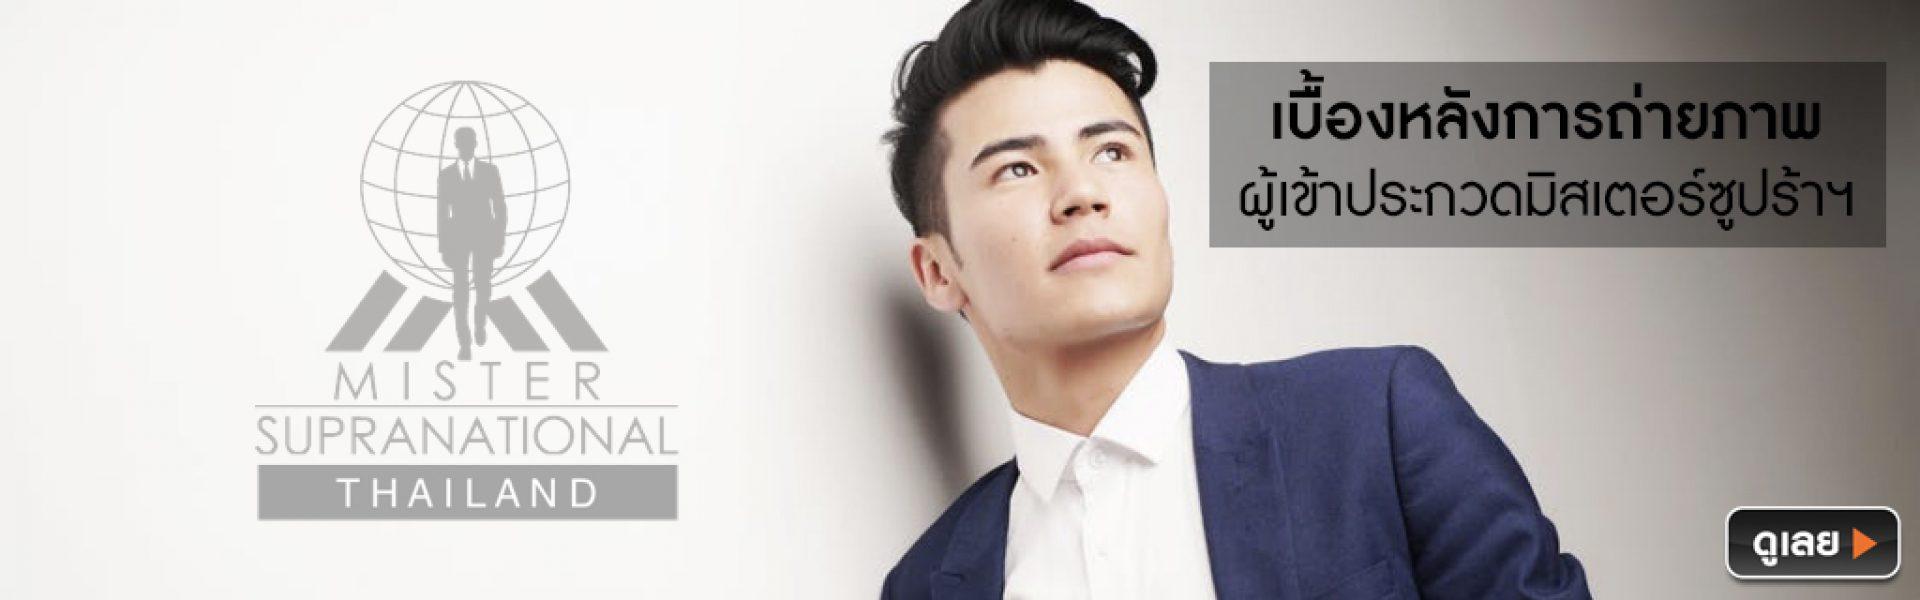 Mister Supranational Thailand feat. งานดีสงขลา